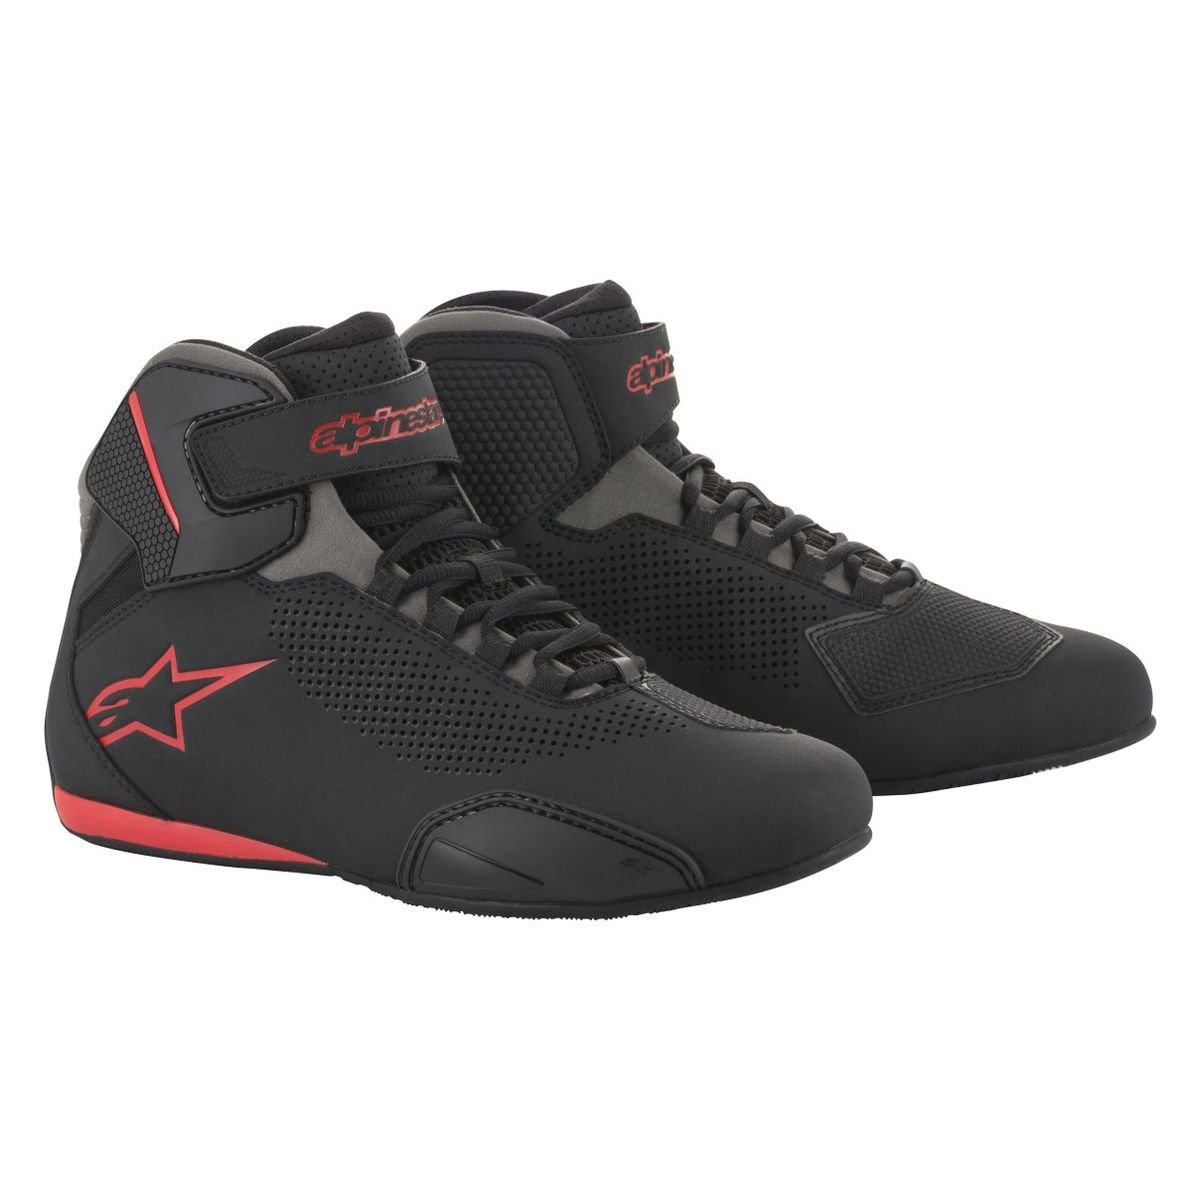 Alpinestars Men's 2515618131135 Shoe (Black/Grey/Red, Size 13.5)